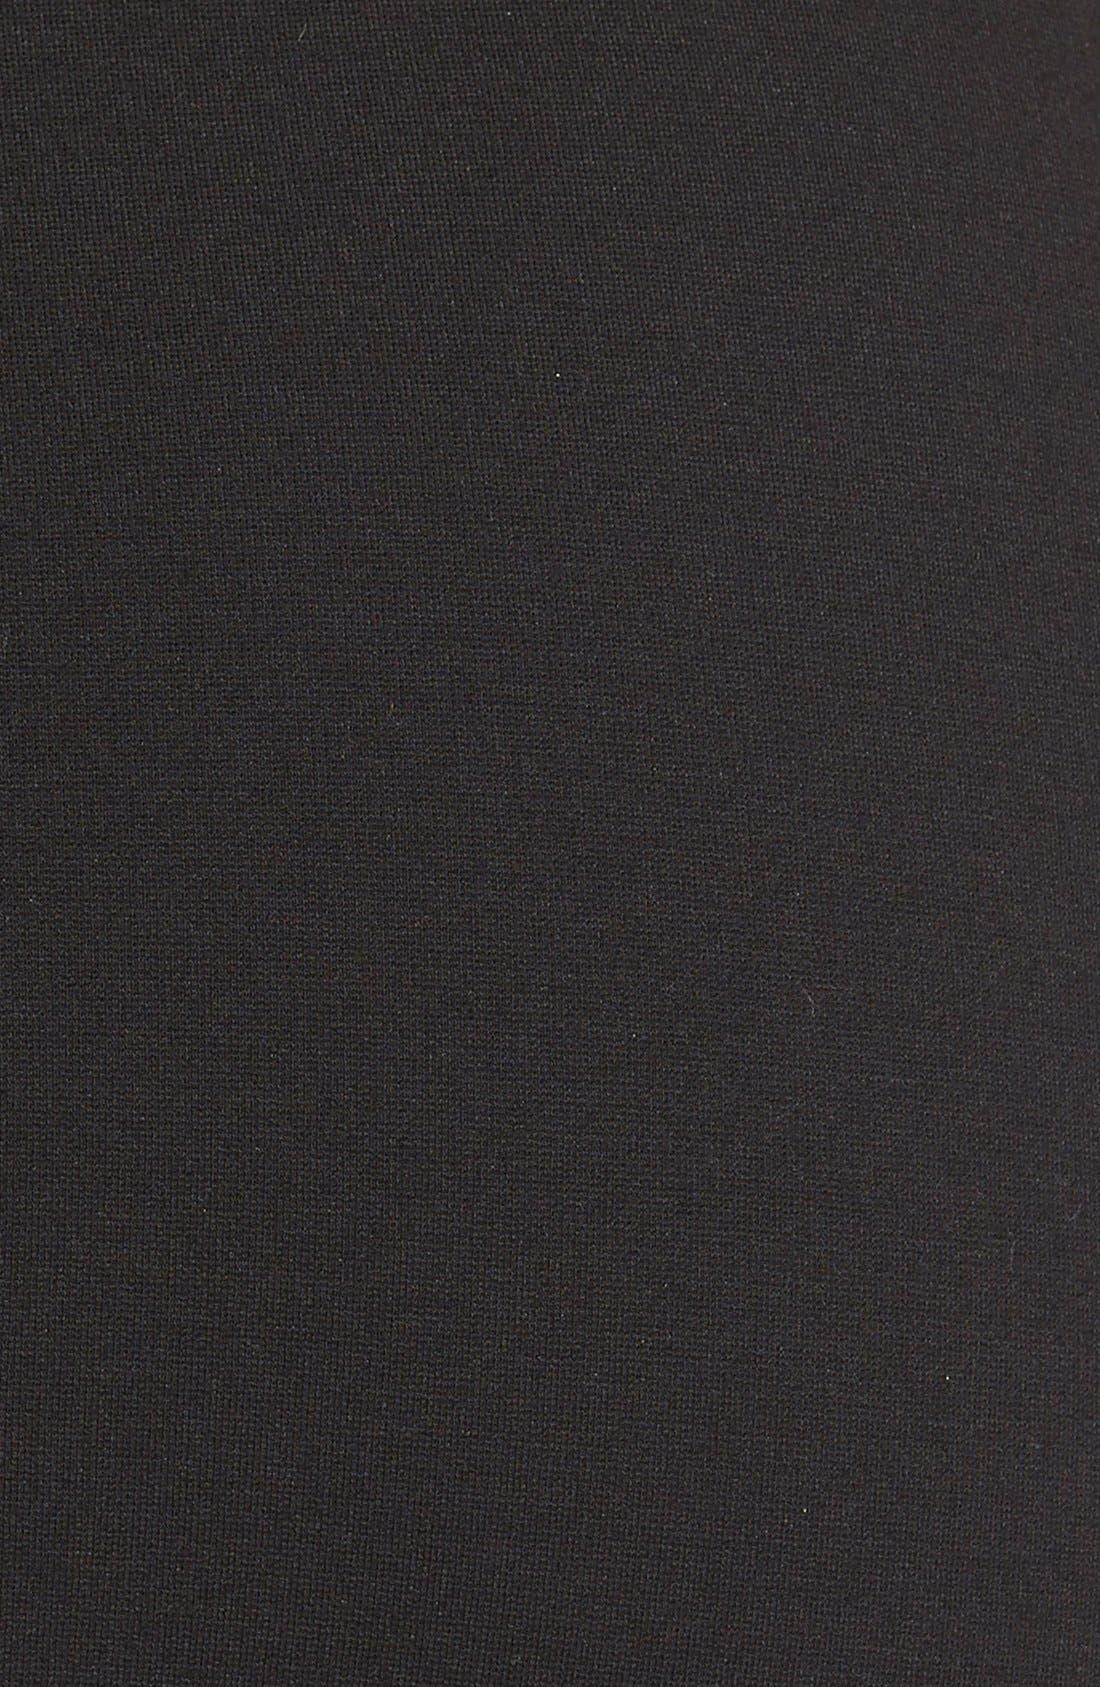 Alternate Image 3  - Lafayette 148 New York Faux Leather Trim Punto Milano Long Pencil Skirt